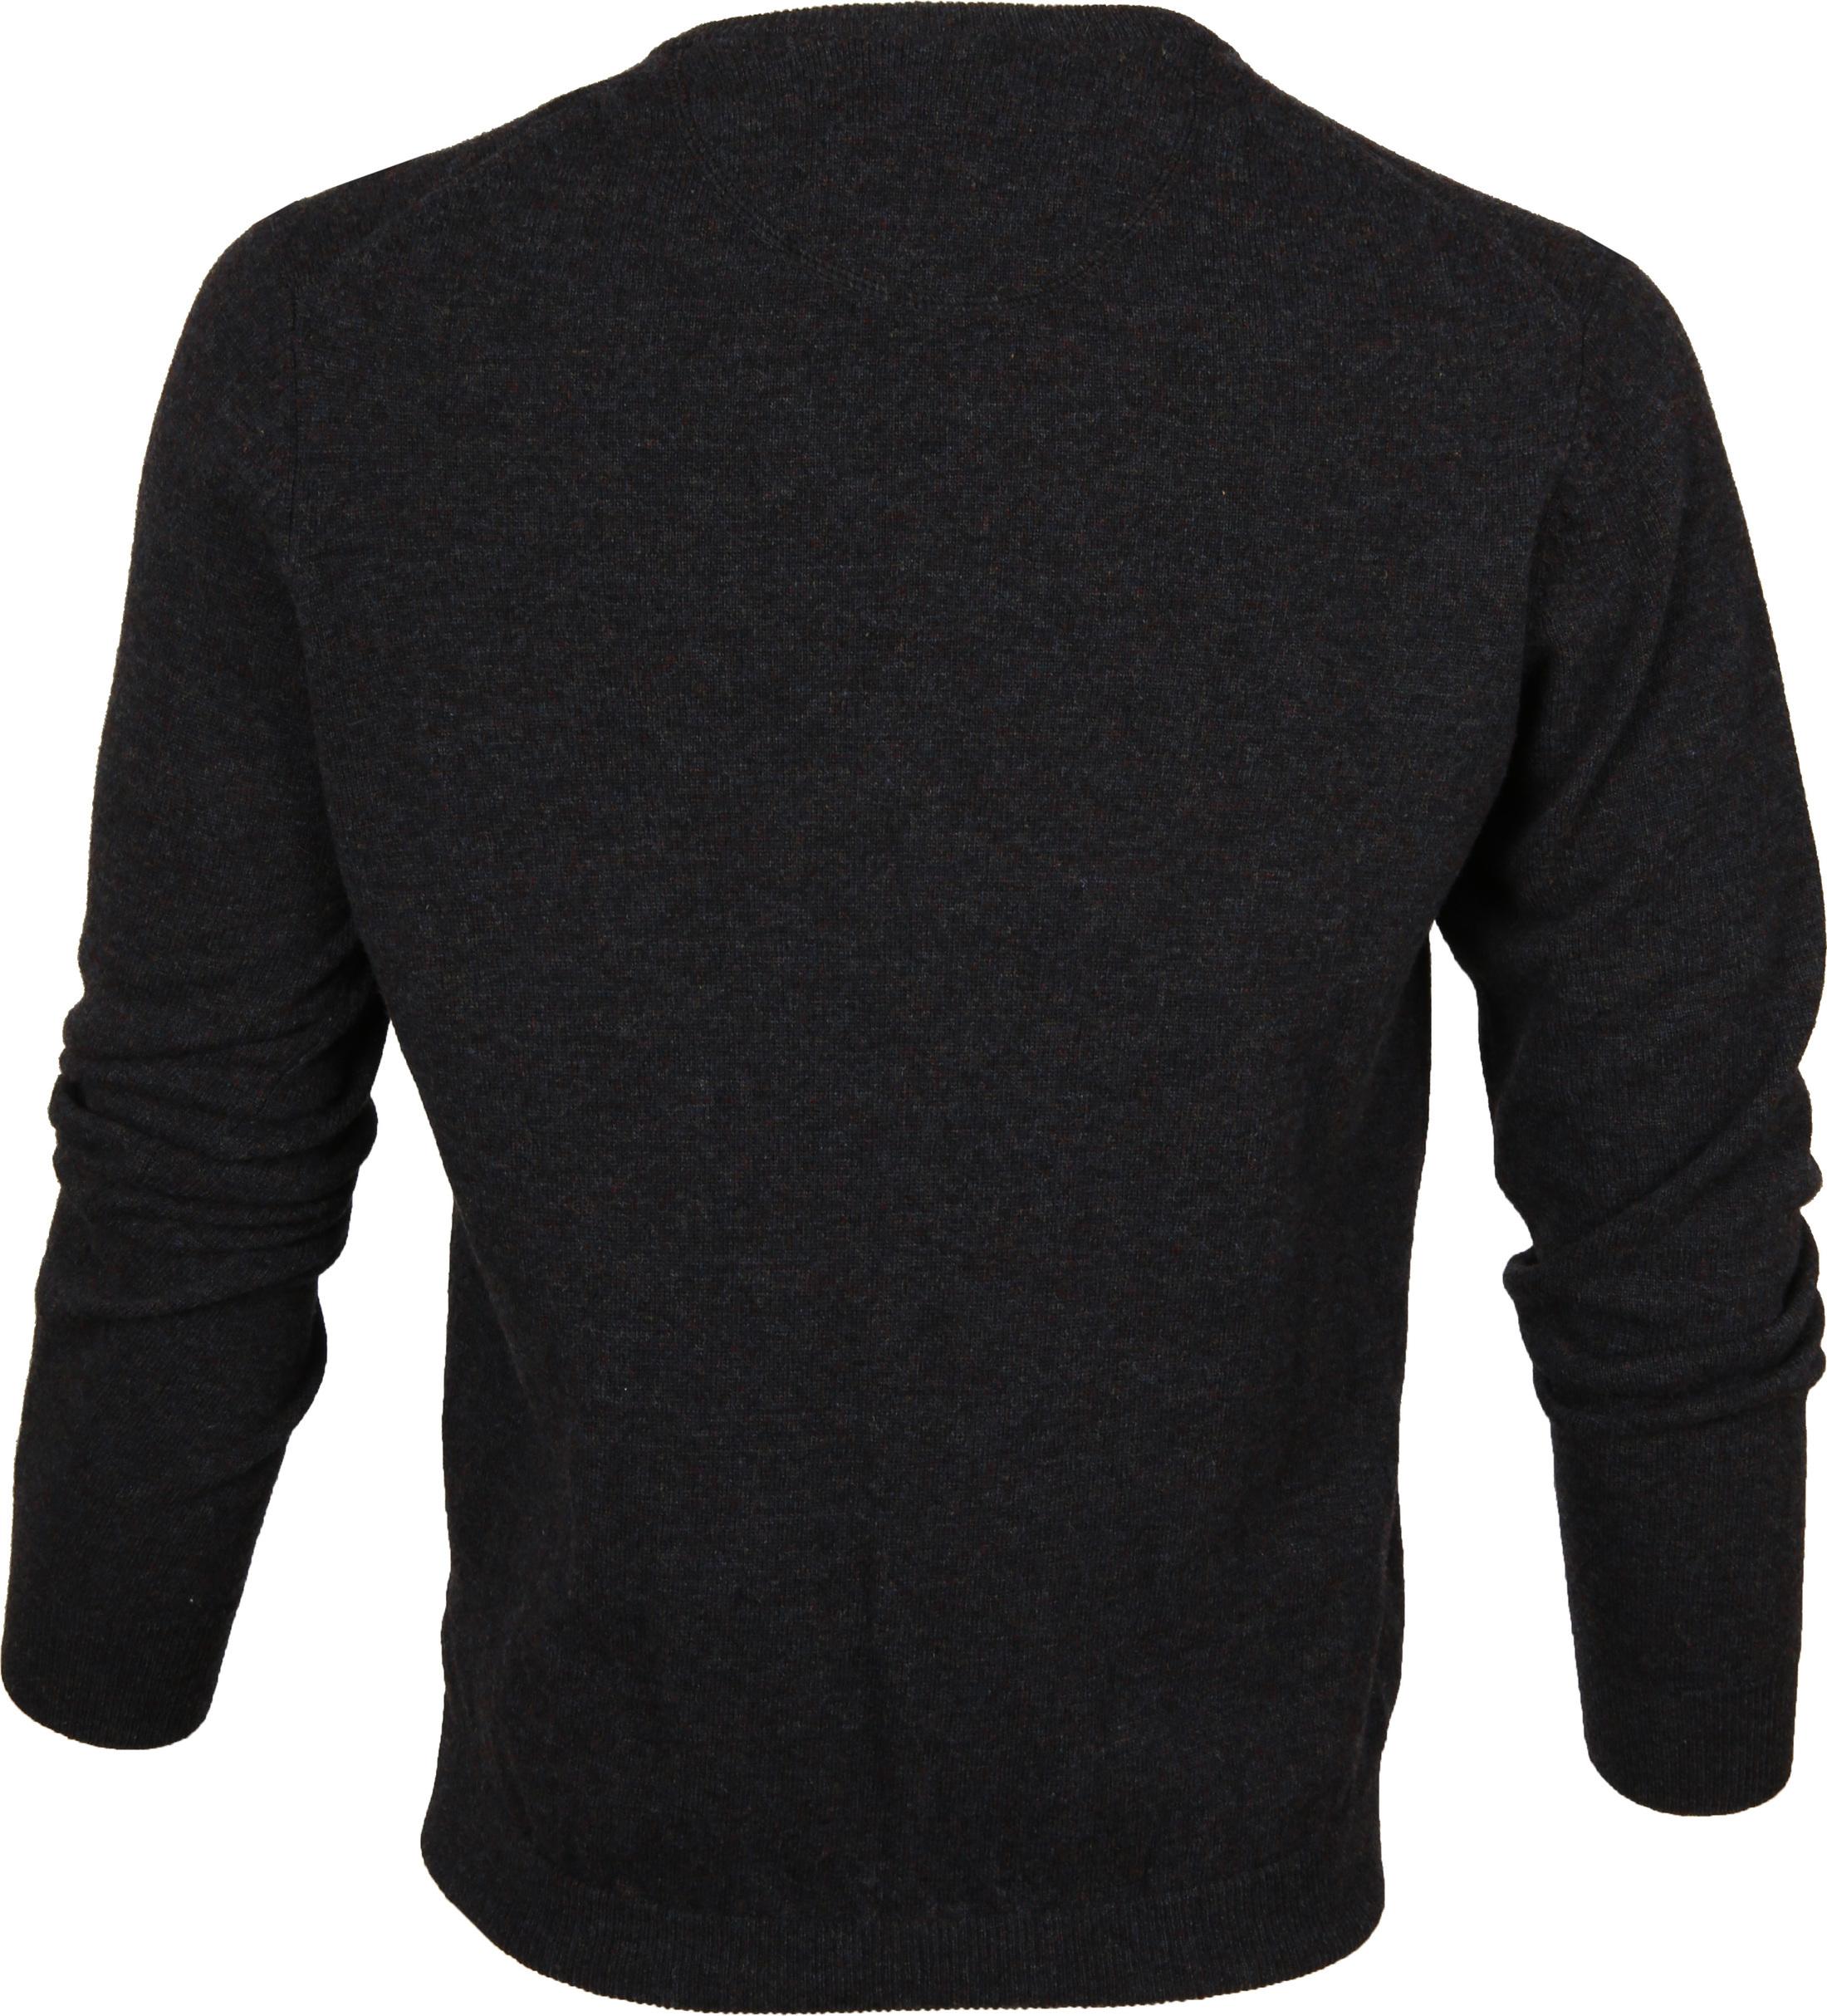 Suitable Pullover Lamswol V-Hals Antraciet foto 2